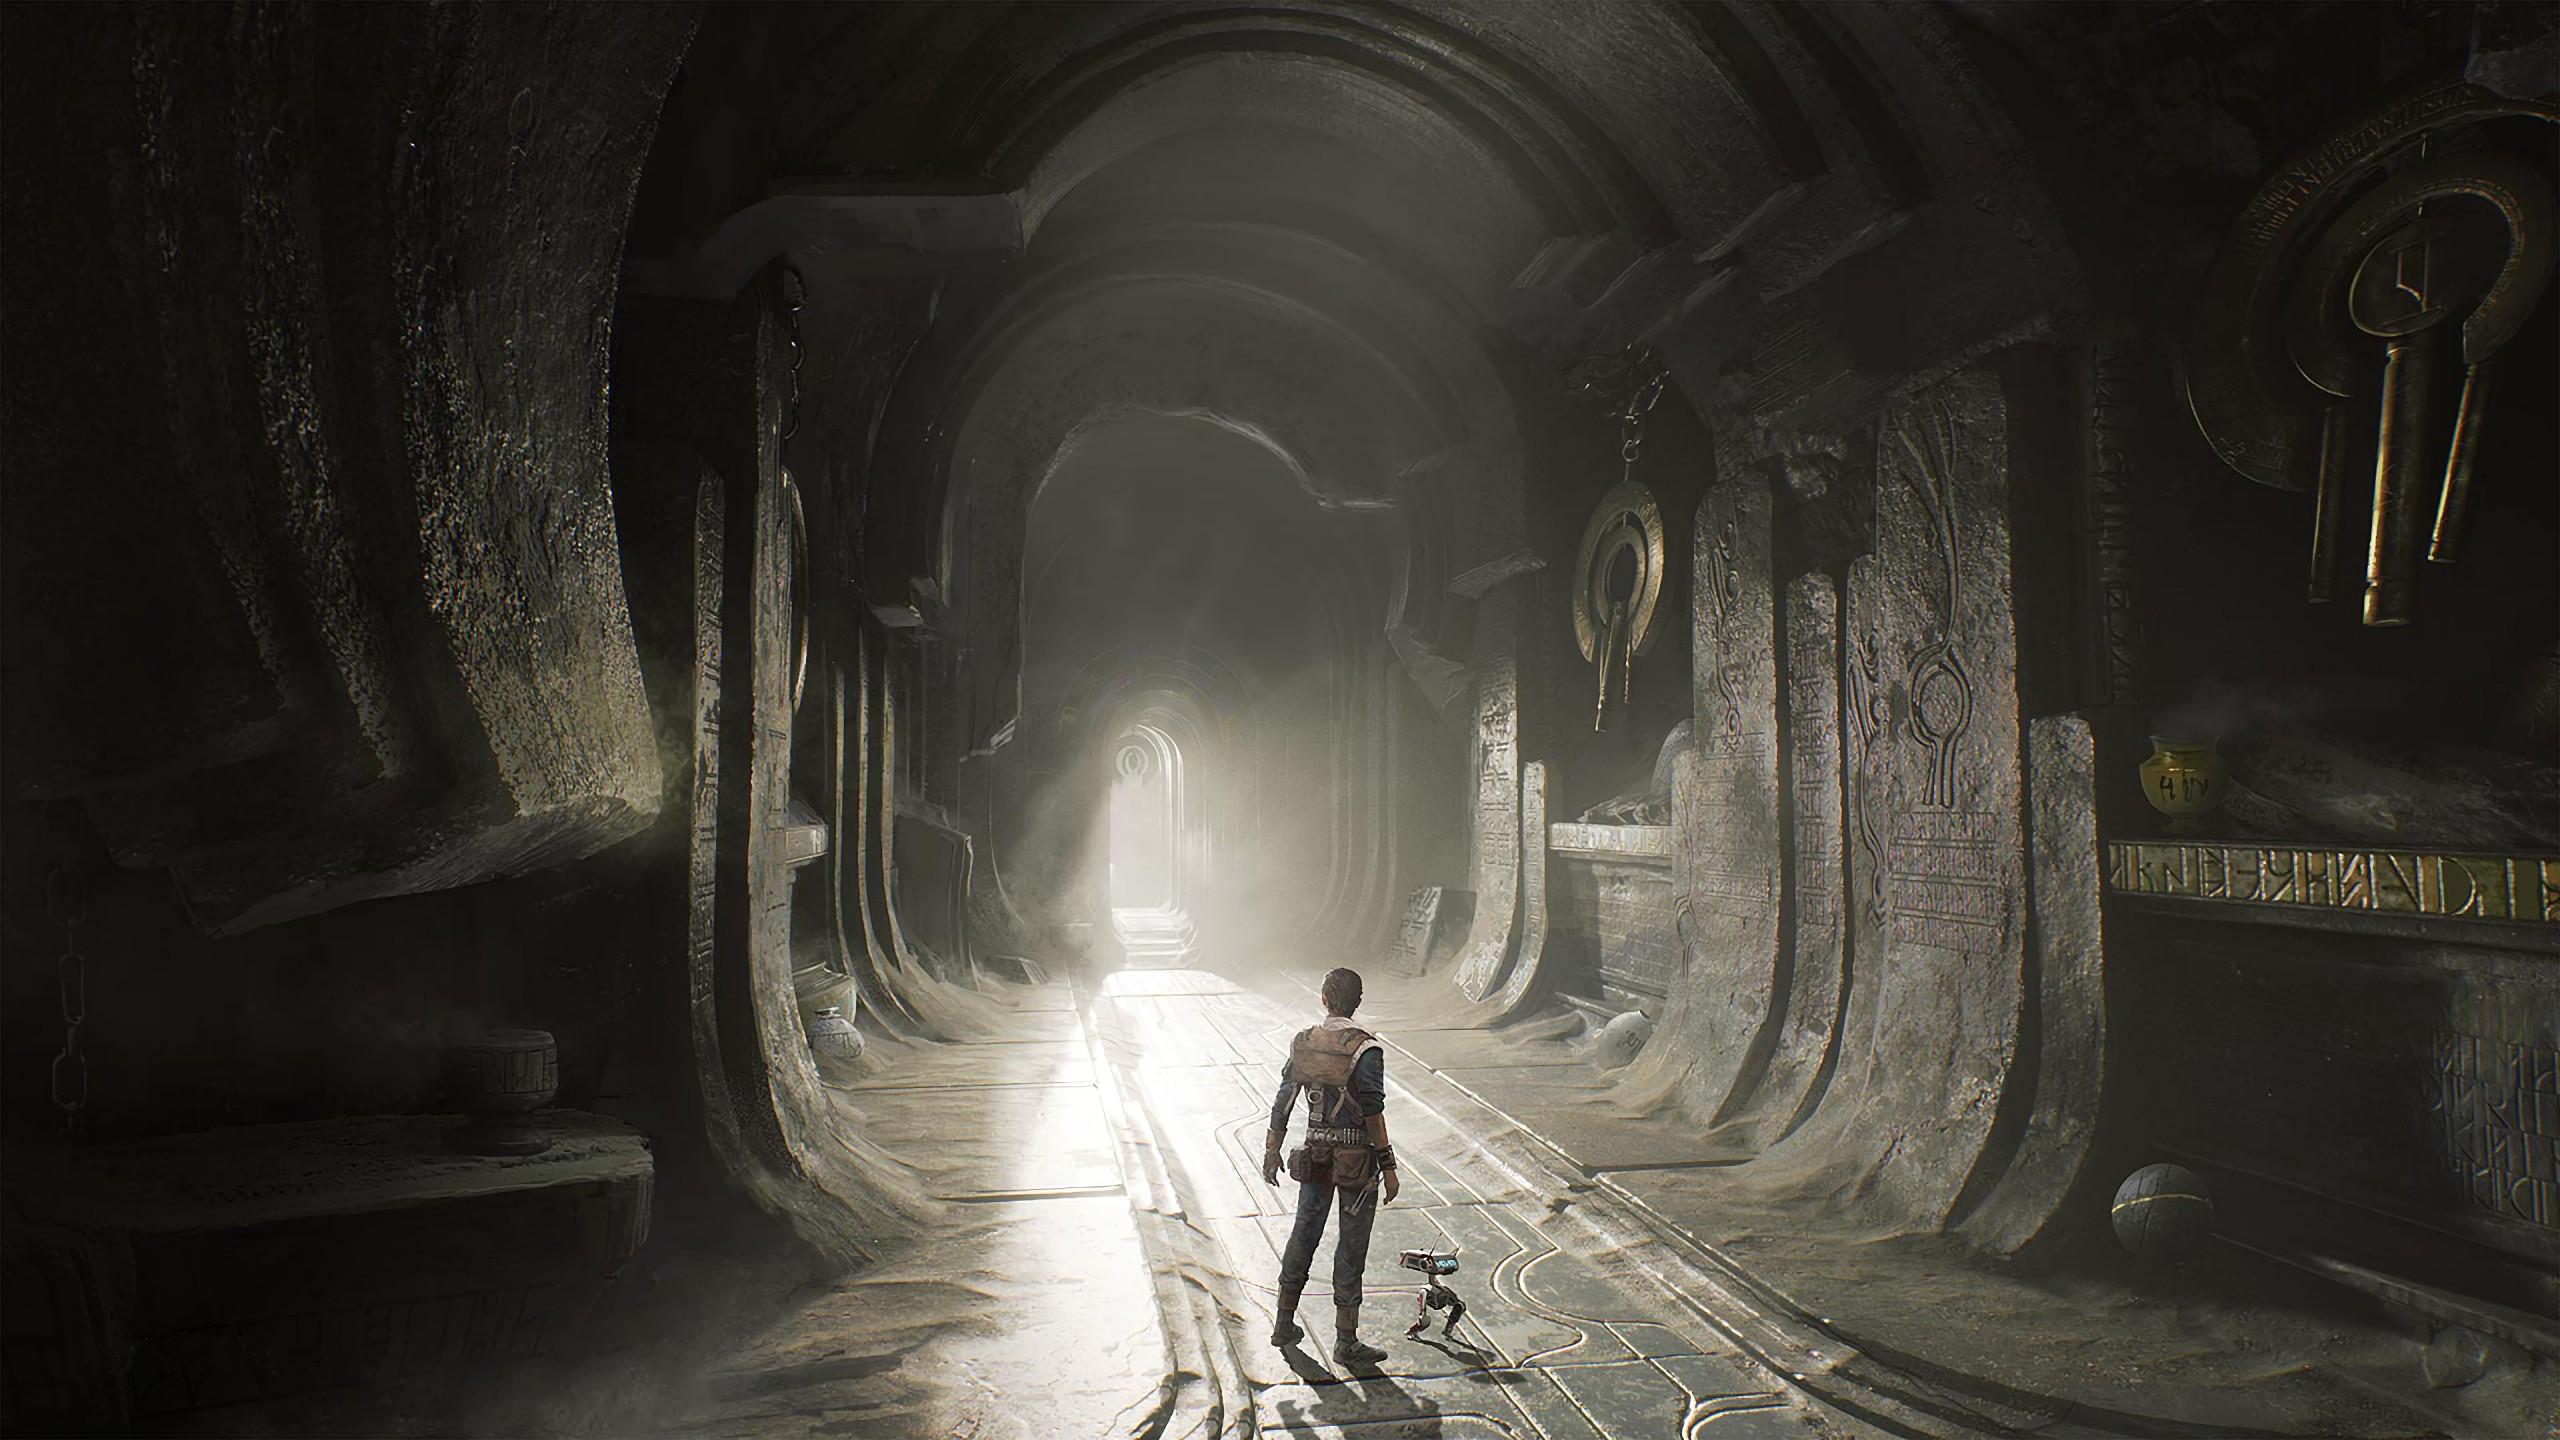 Wallpaper Star Wars Jedi Fallen Order Screenshot 4k Games 21511